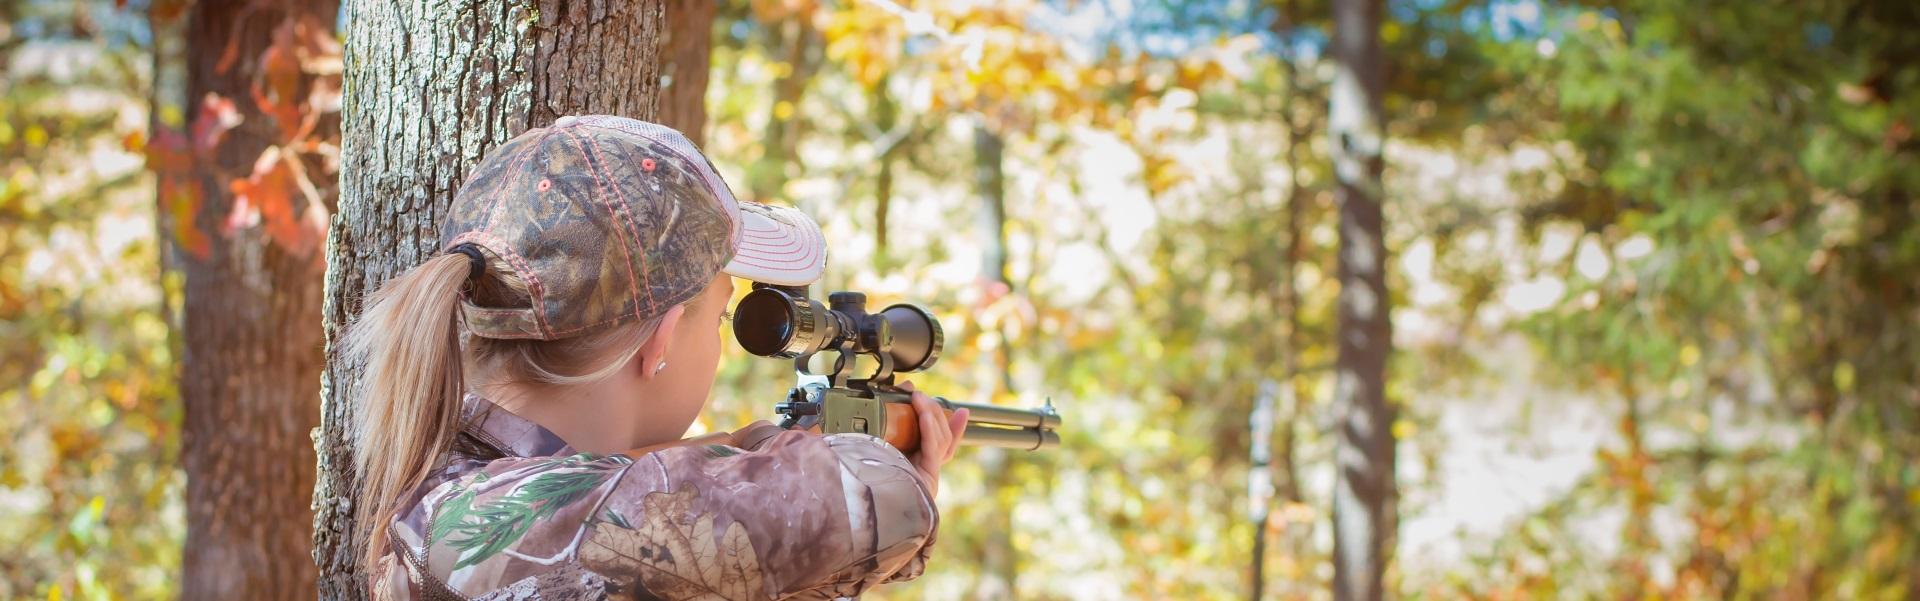 Female Gun Enthusiasts